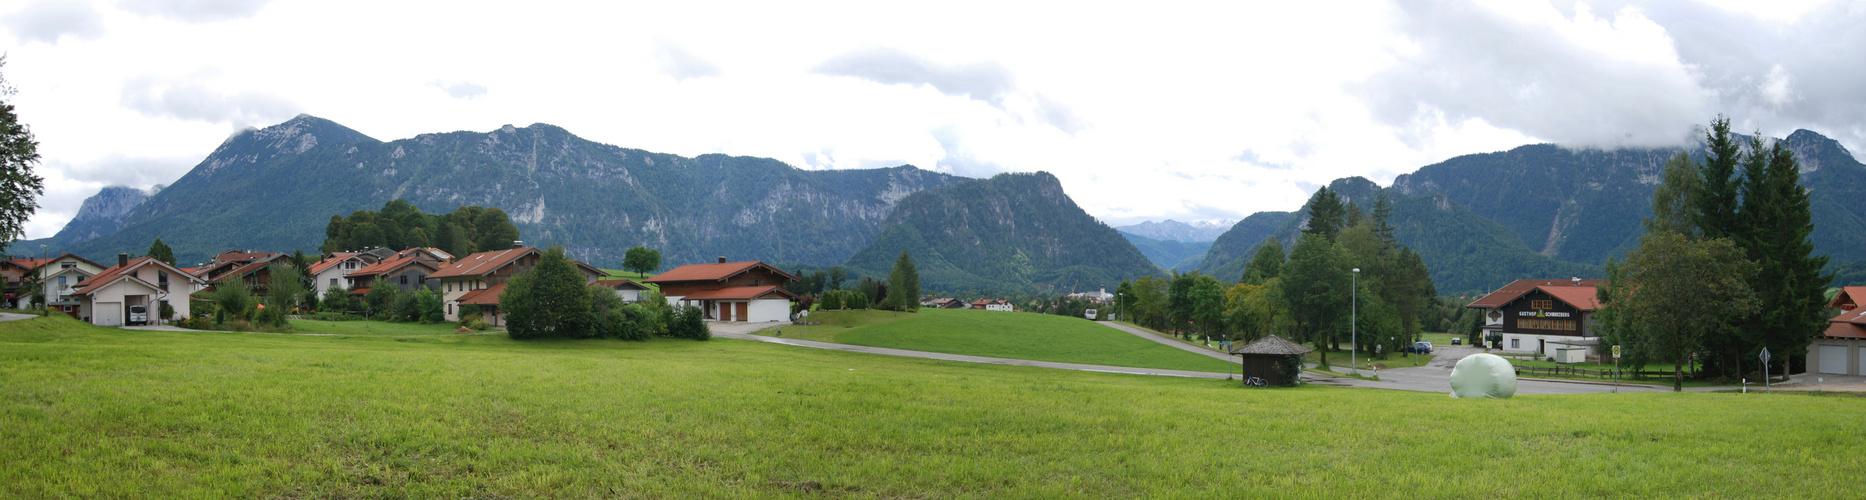 Bergpanorama bei Inzell